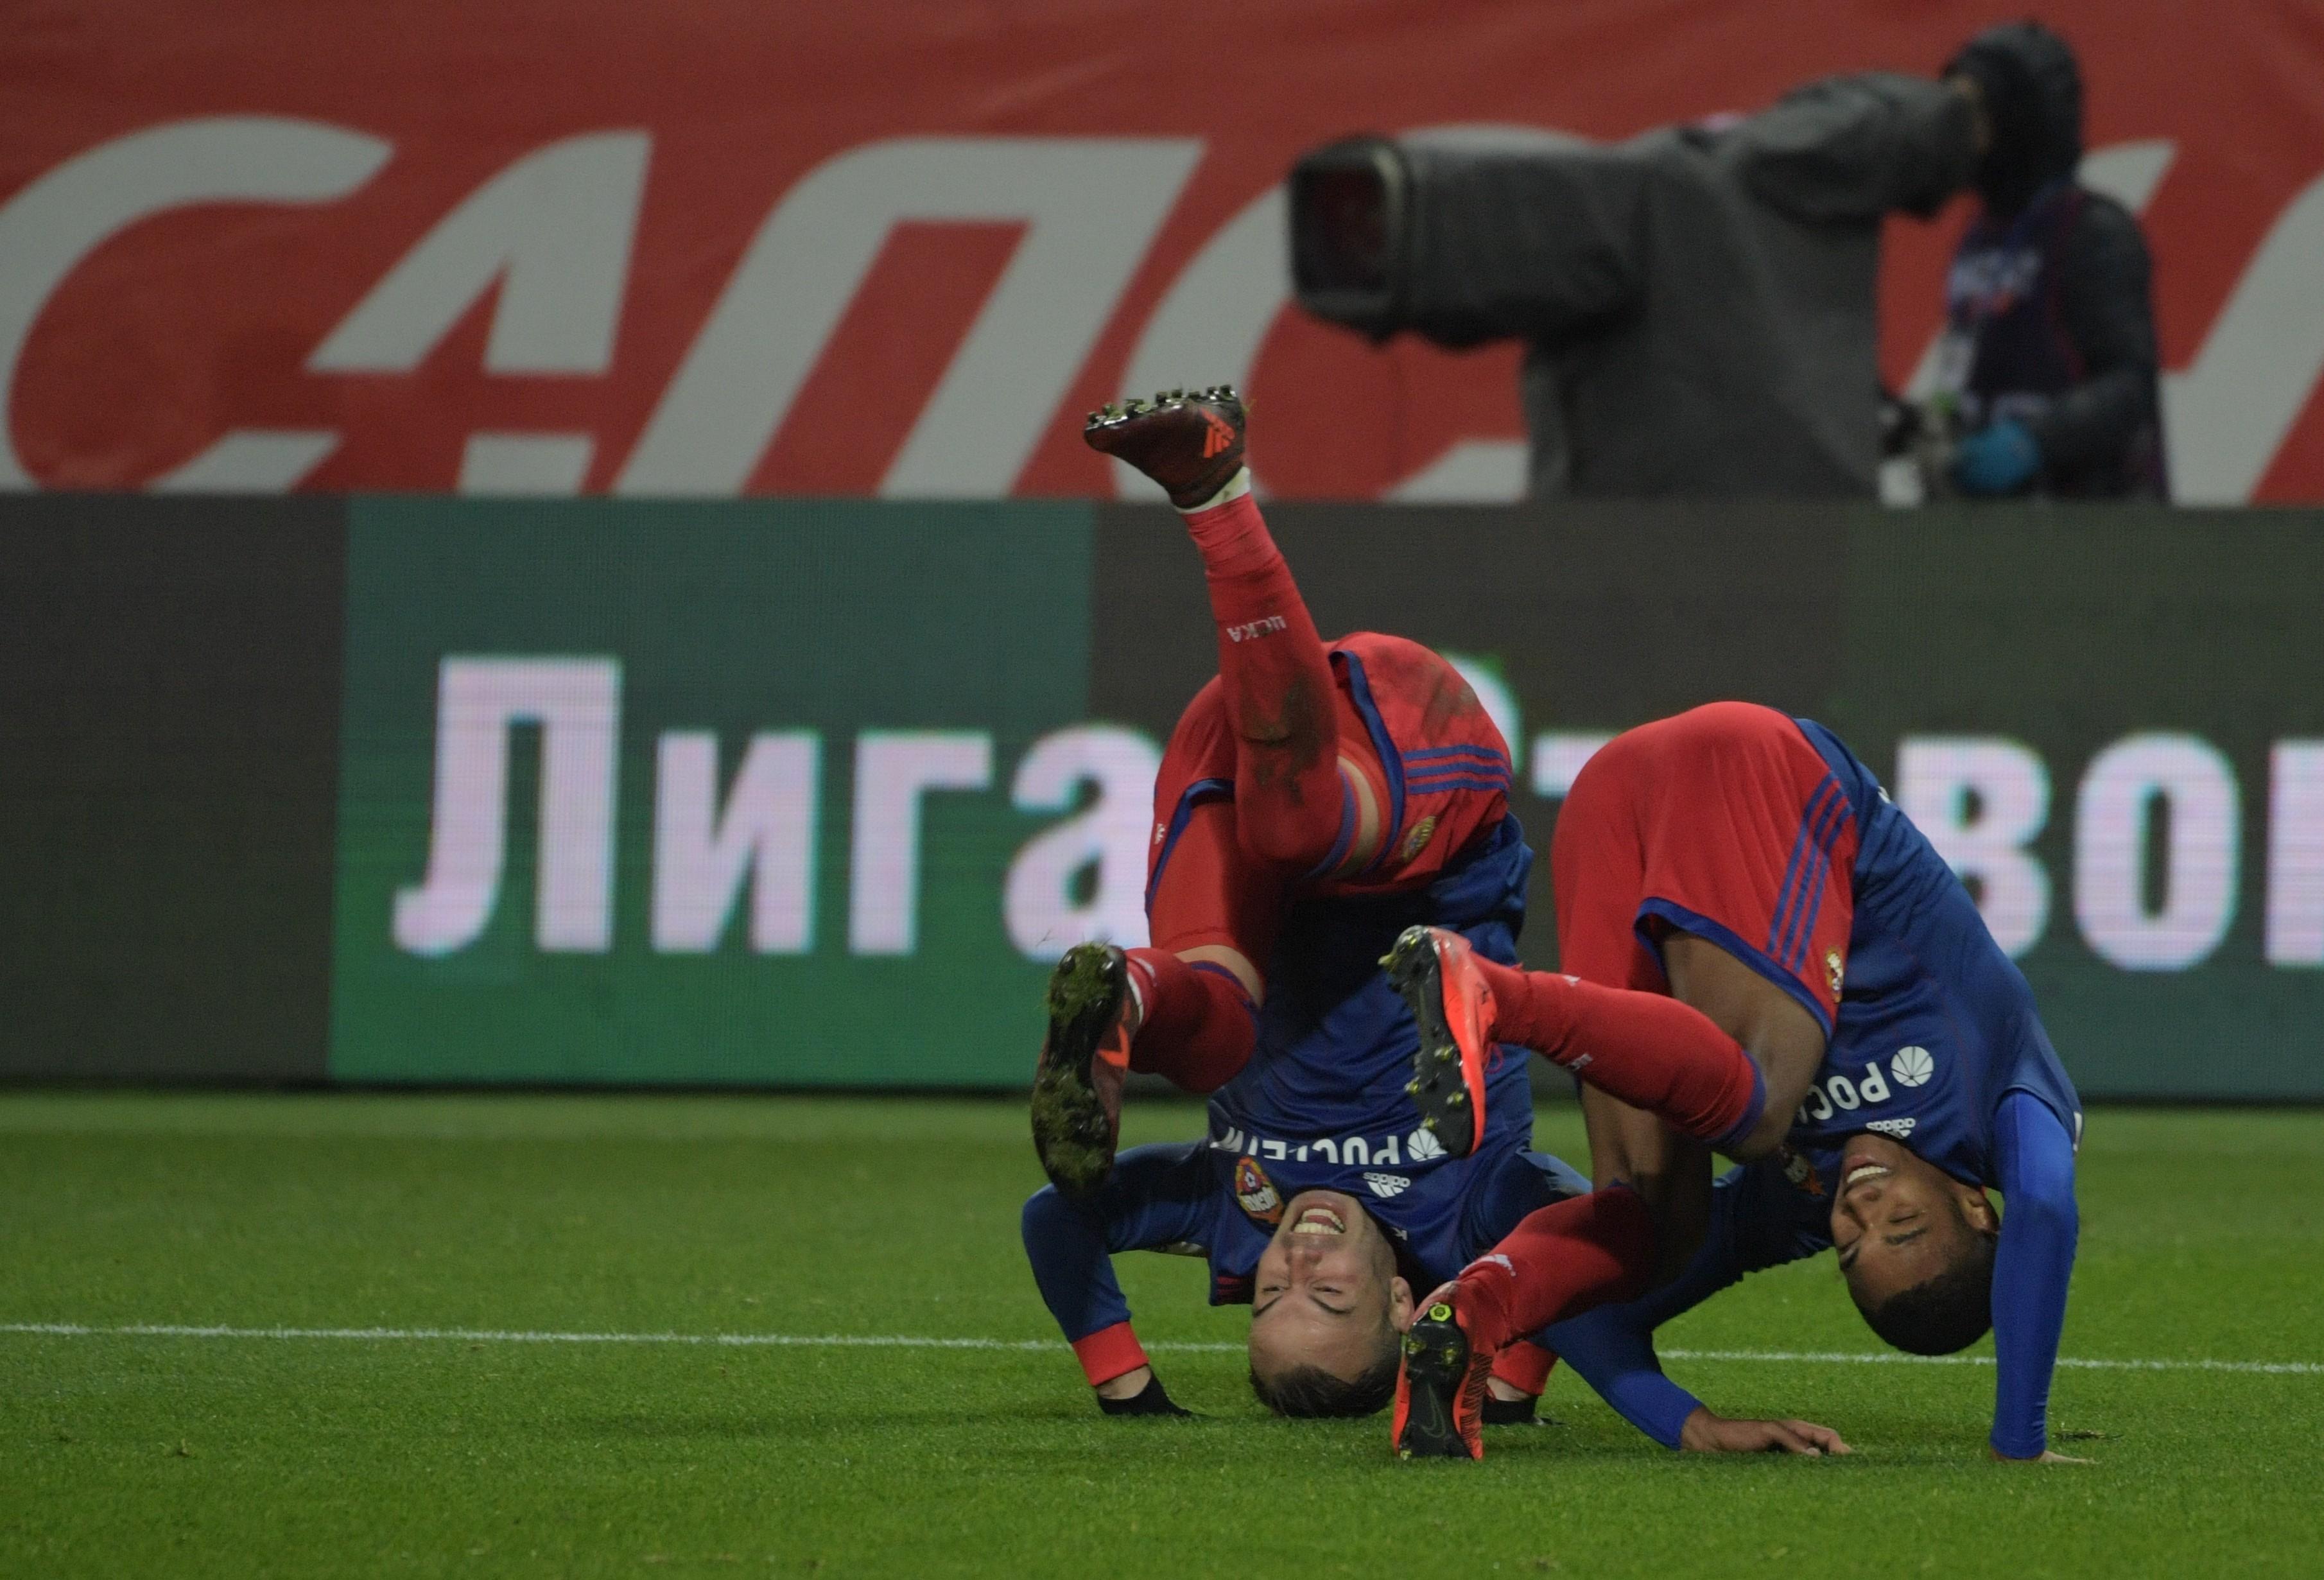 Фото: РИА Новости/Владимир Федоренко